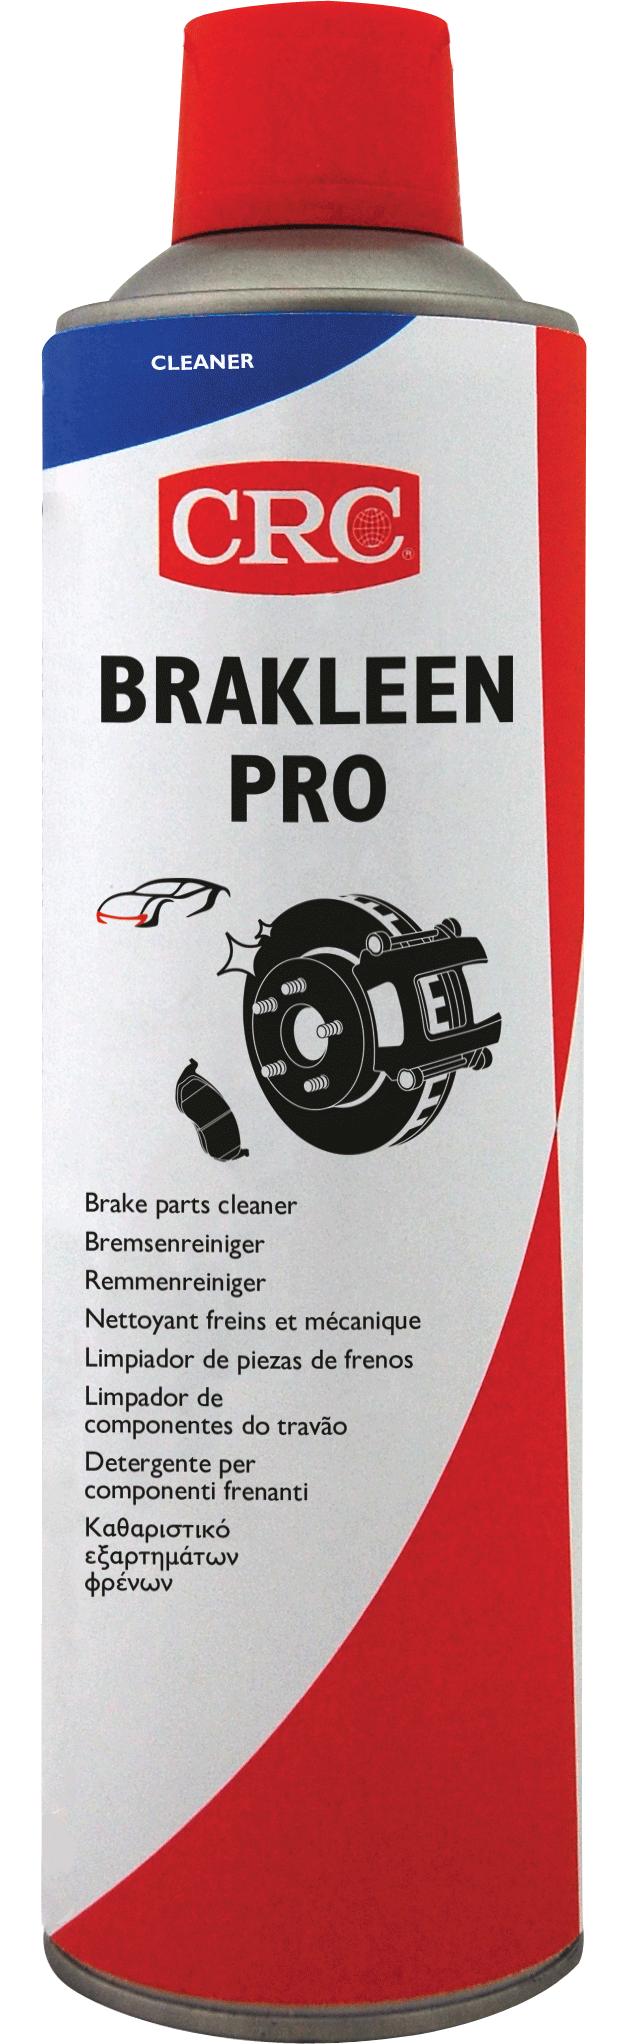 Afbeelding van crc automotive brakleen pro remmenreiniger 500 ml, spuitbus